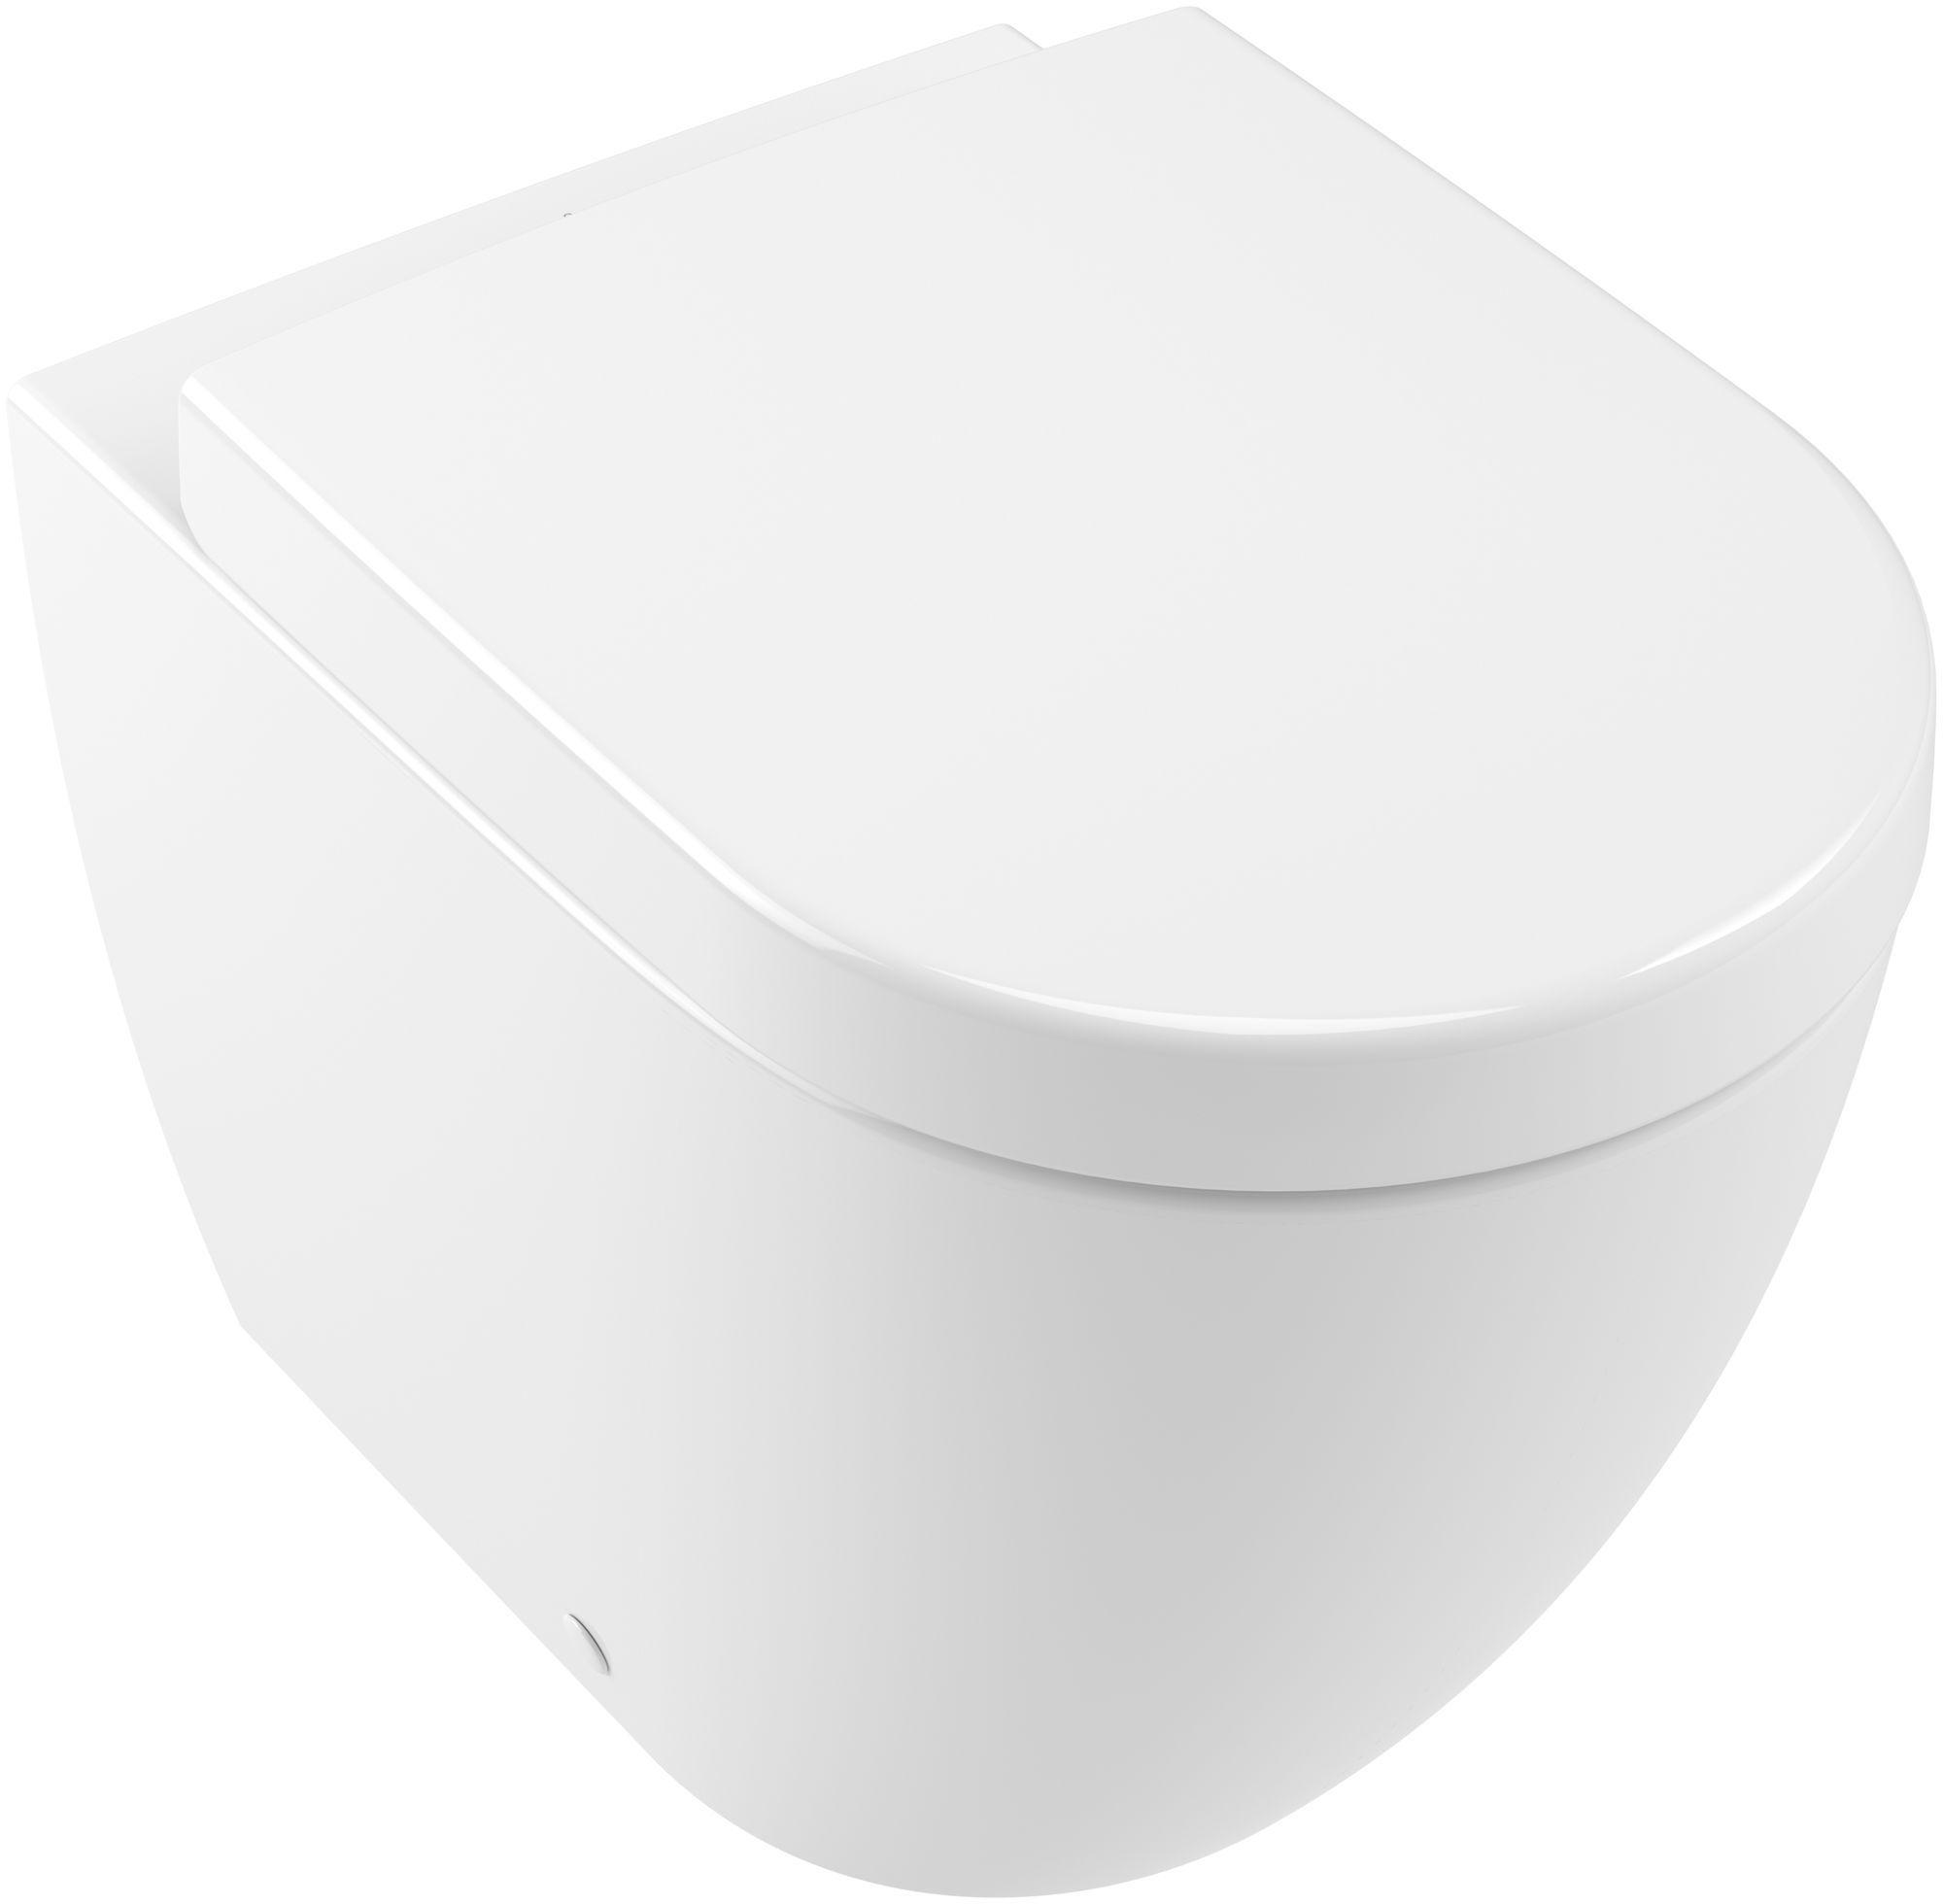 Villeroy & Boch Subway 2.0 Tiefspül-Stand-WC spülrandlos DirectFlush B:37xL:56cm weiß 5602R001